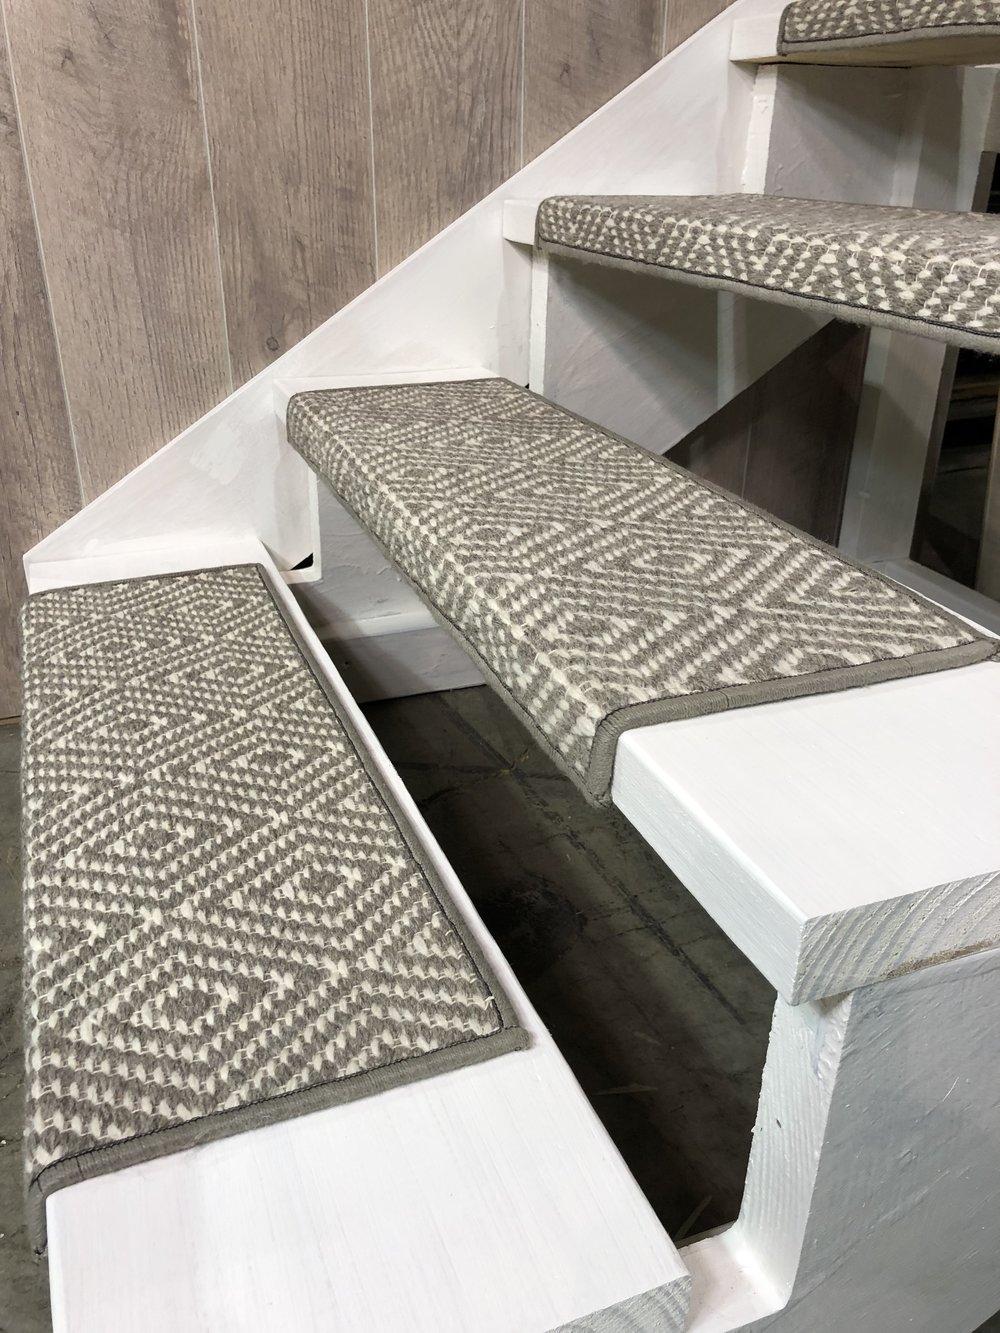 Benefits Of Custom Stair Treads